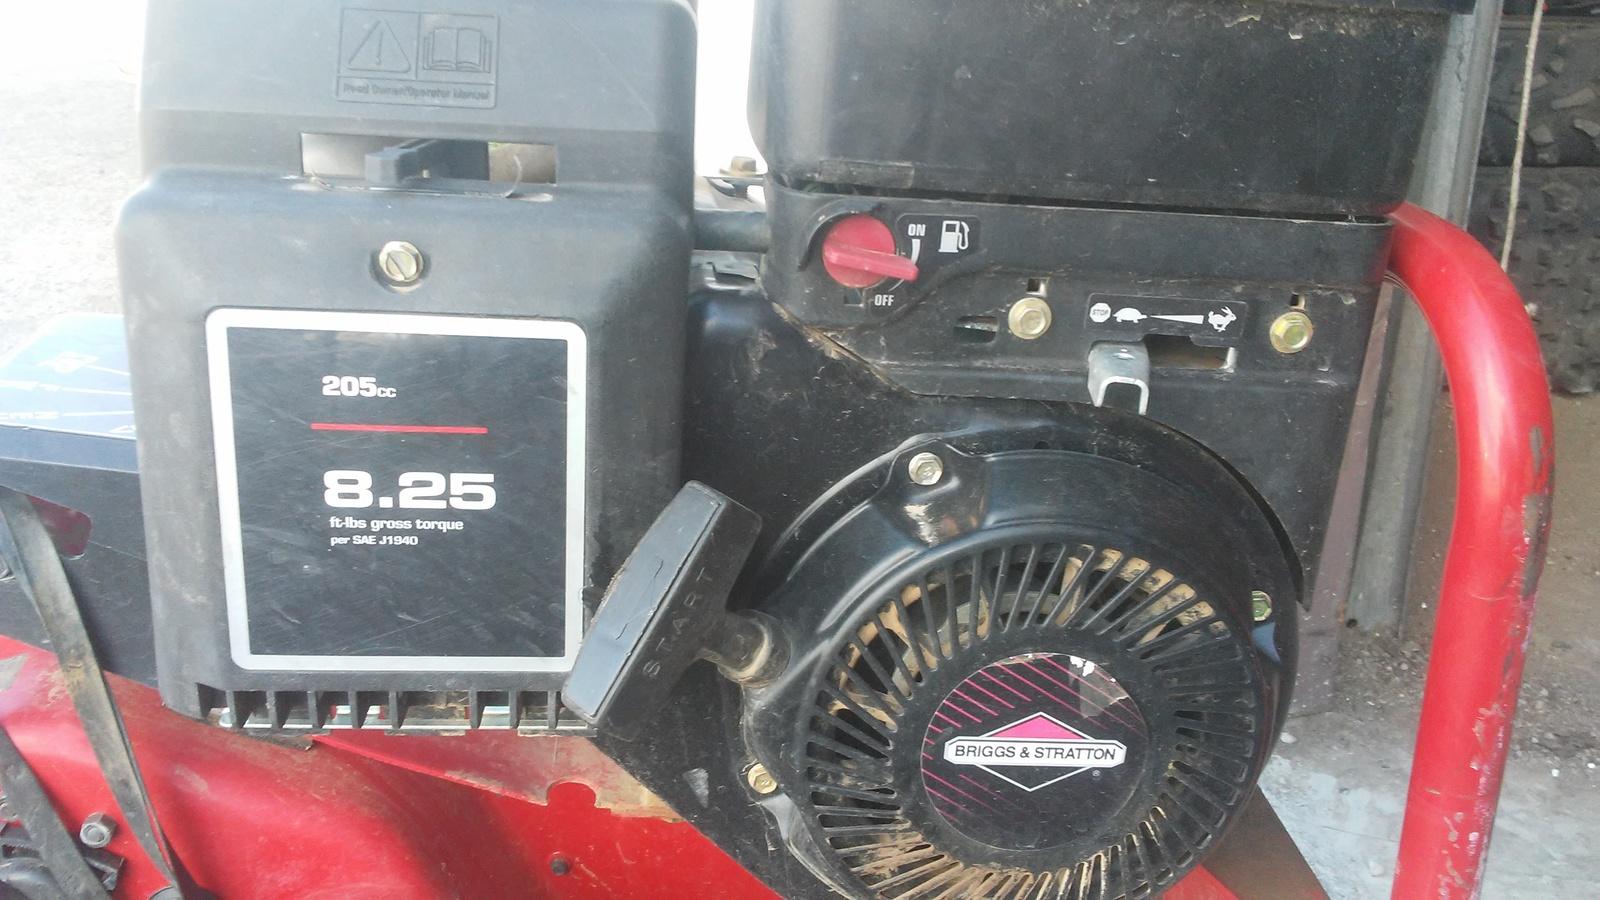 Snapper Tiller IR5003B(84237) Carburetor and 34 similar items